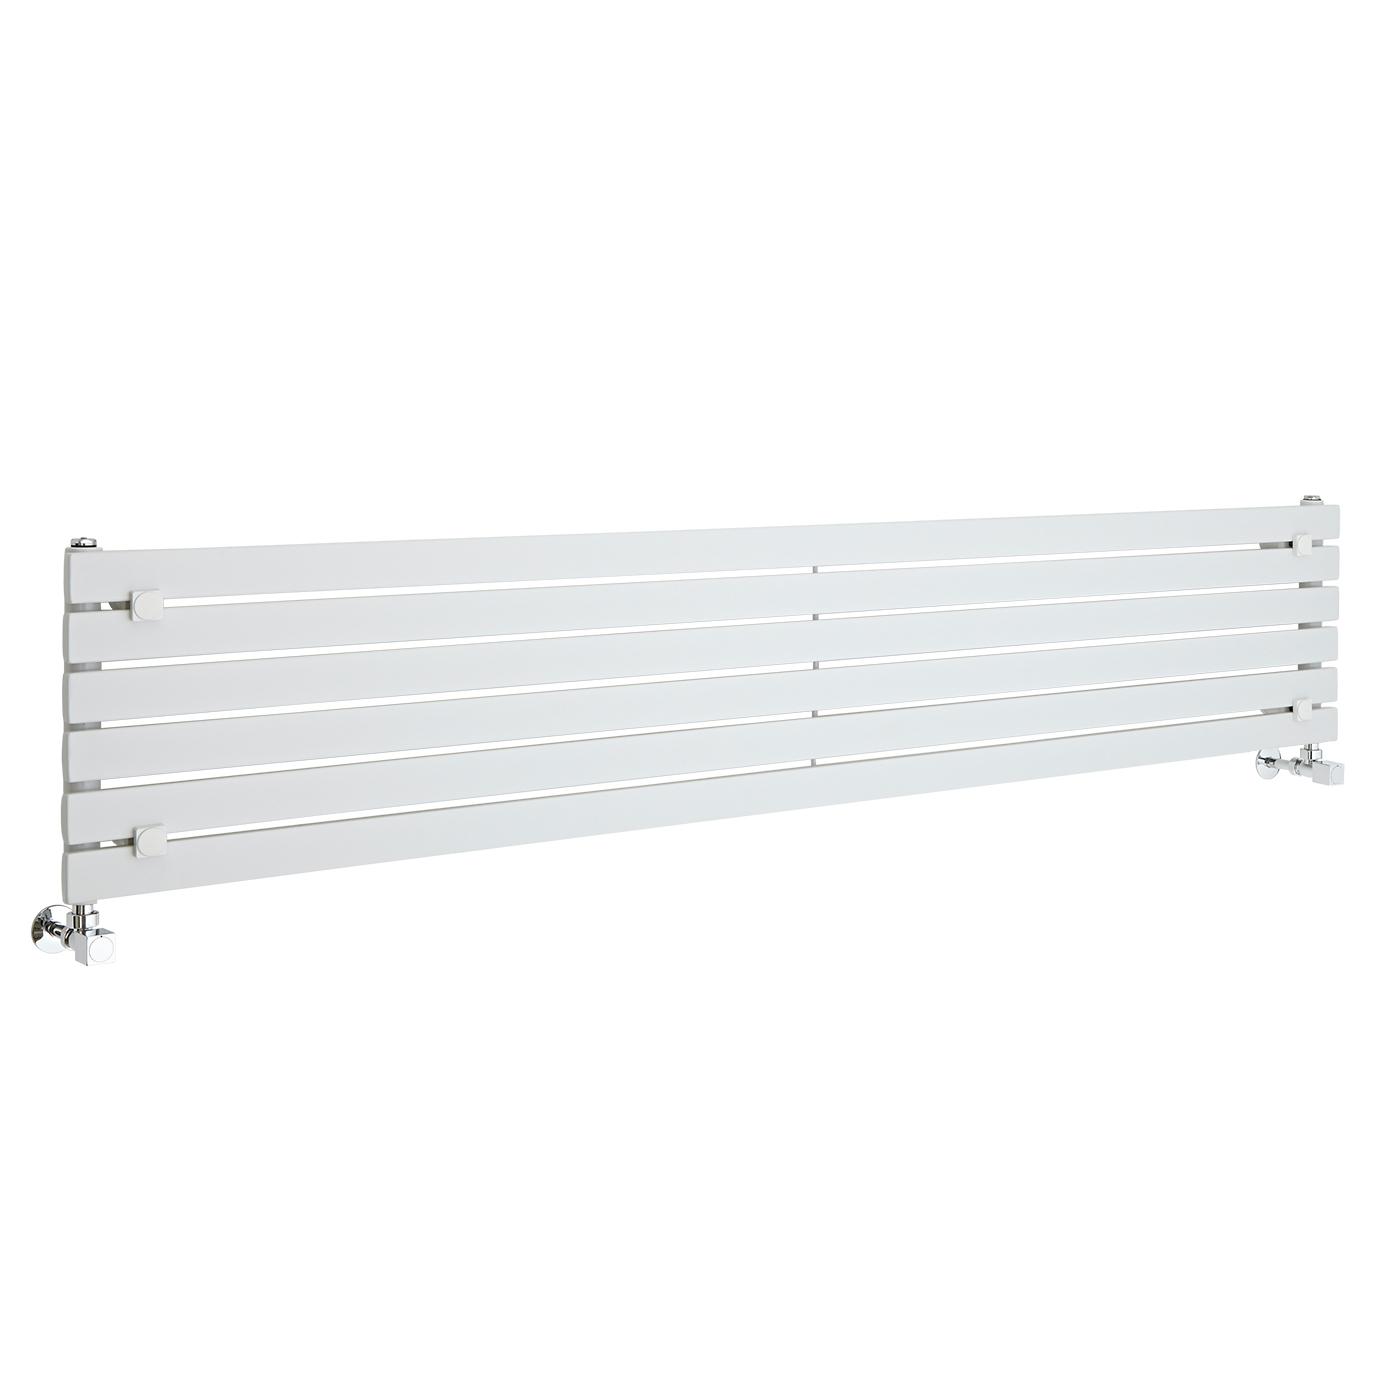 Radiatore di Design Orizzontale  - Bianco - 354mm x 1780mm x 54mm - 821 Watt - Sloane